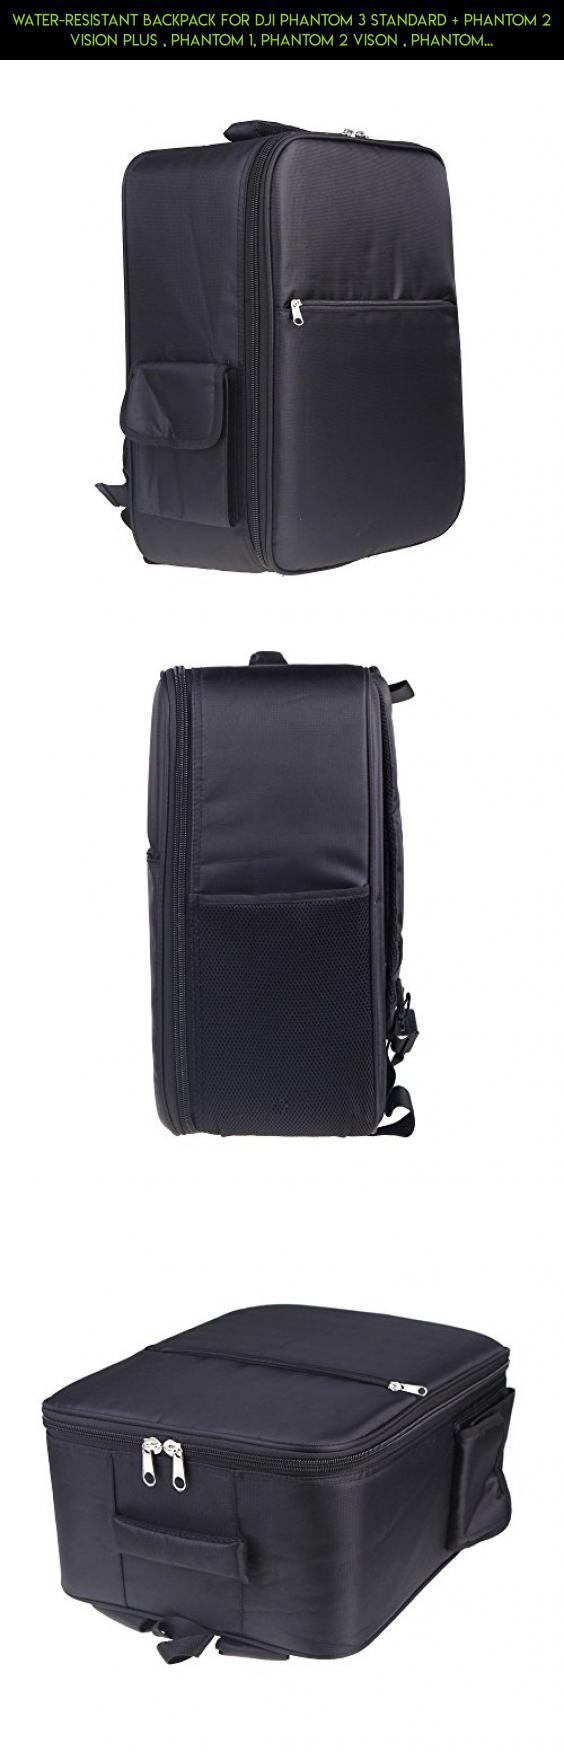 Water-Resistant Backpack for DJI Phantom 3 Standard + Phantom 2 Vision Plus , Phantom